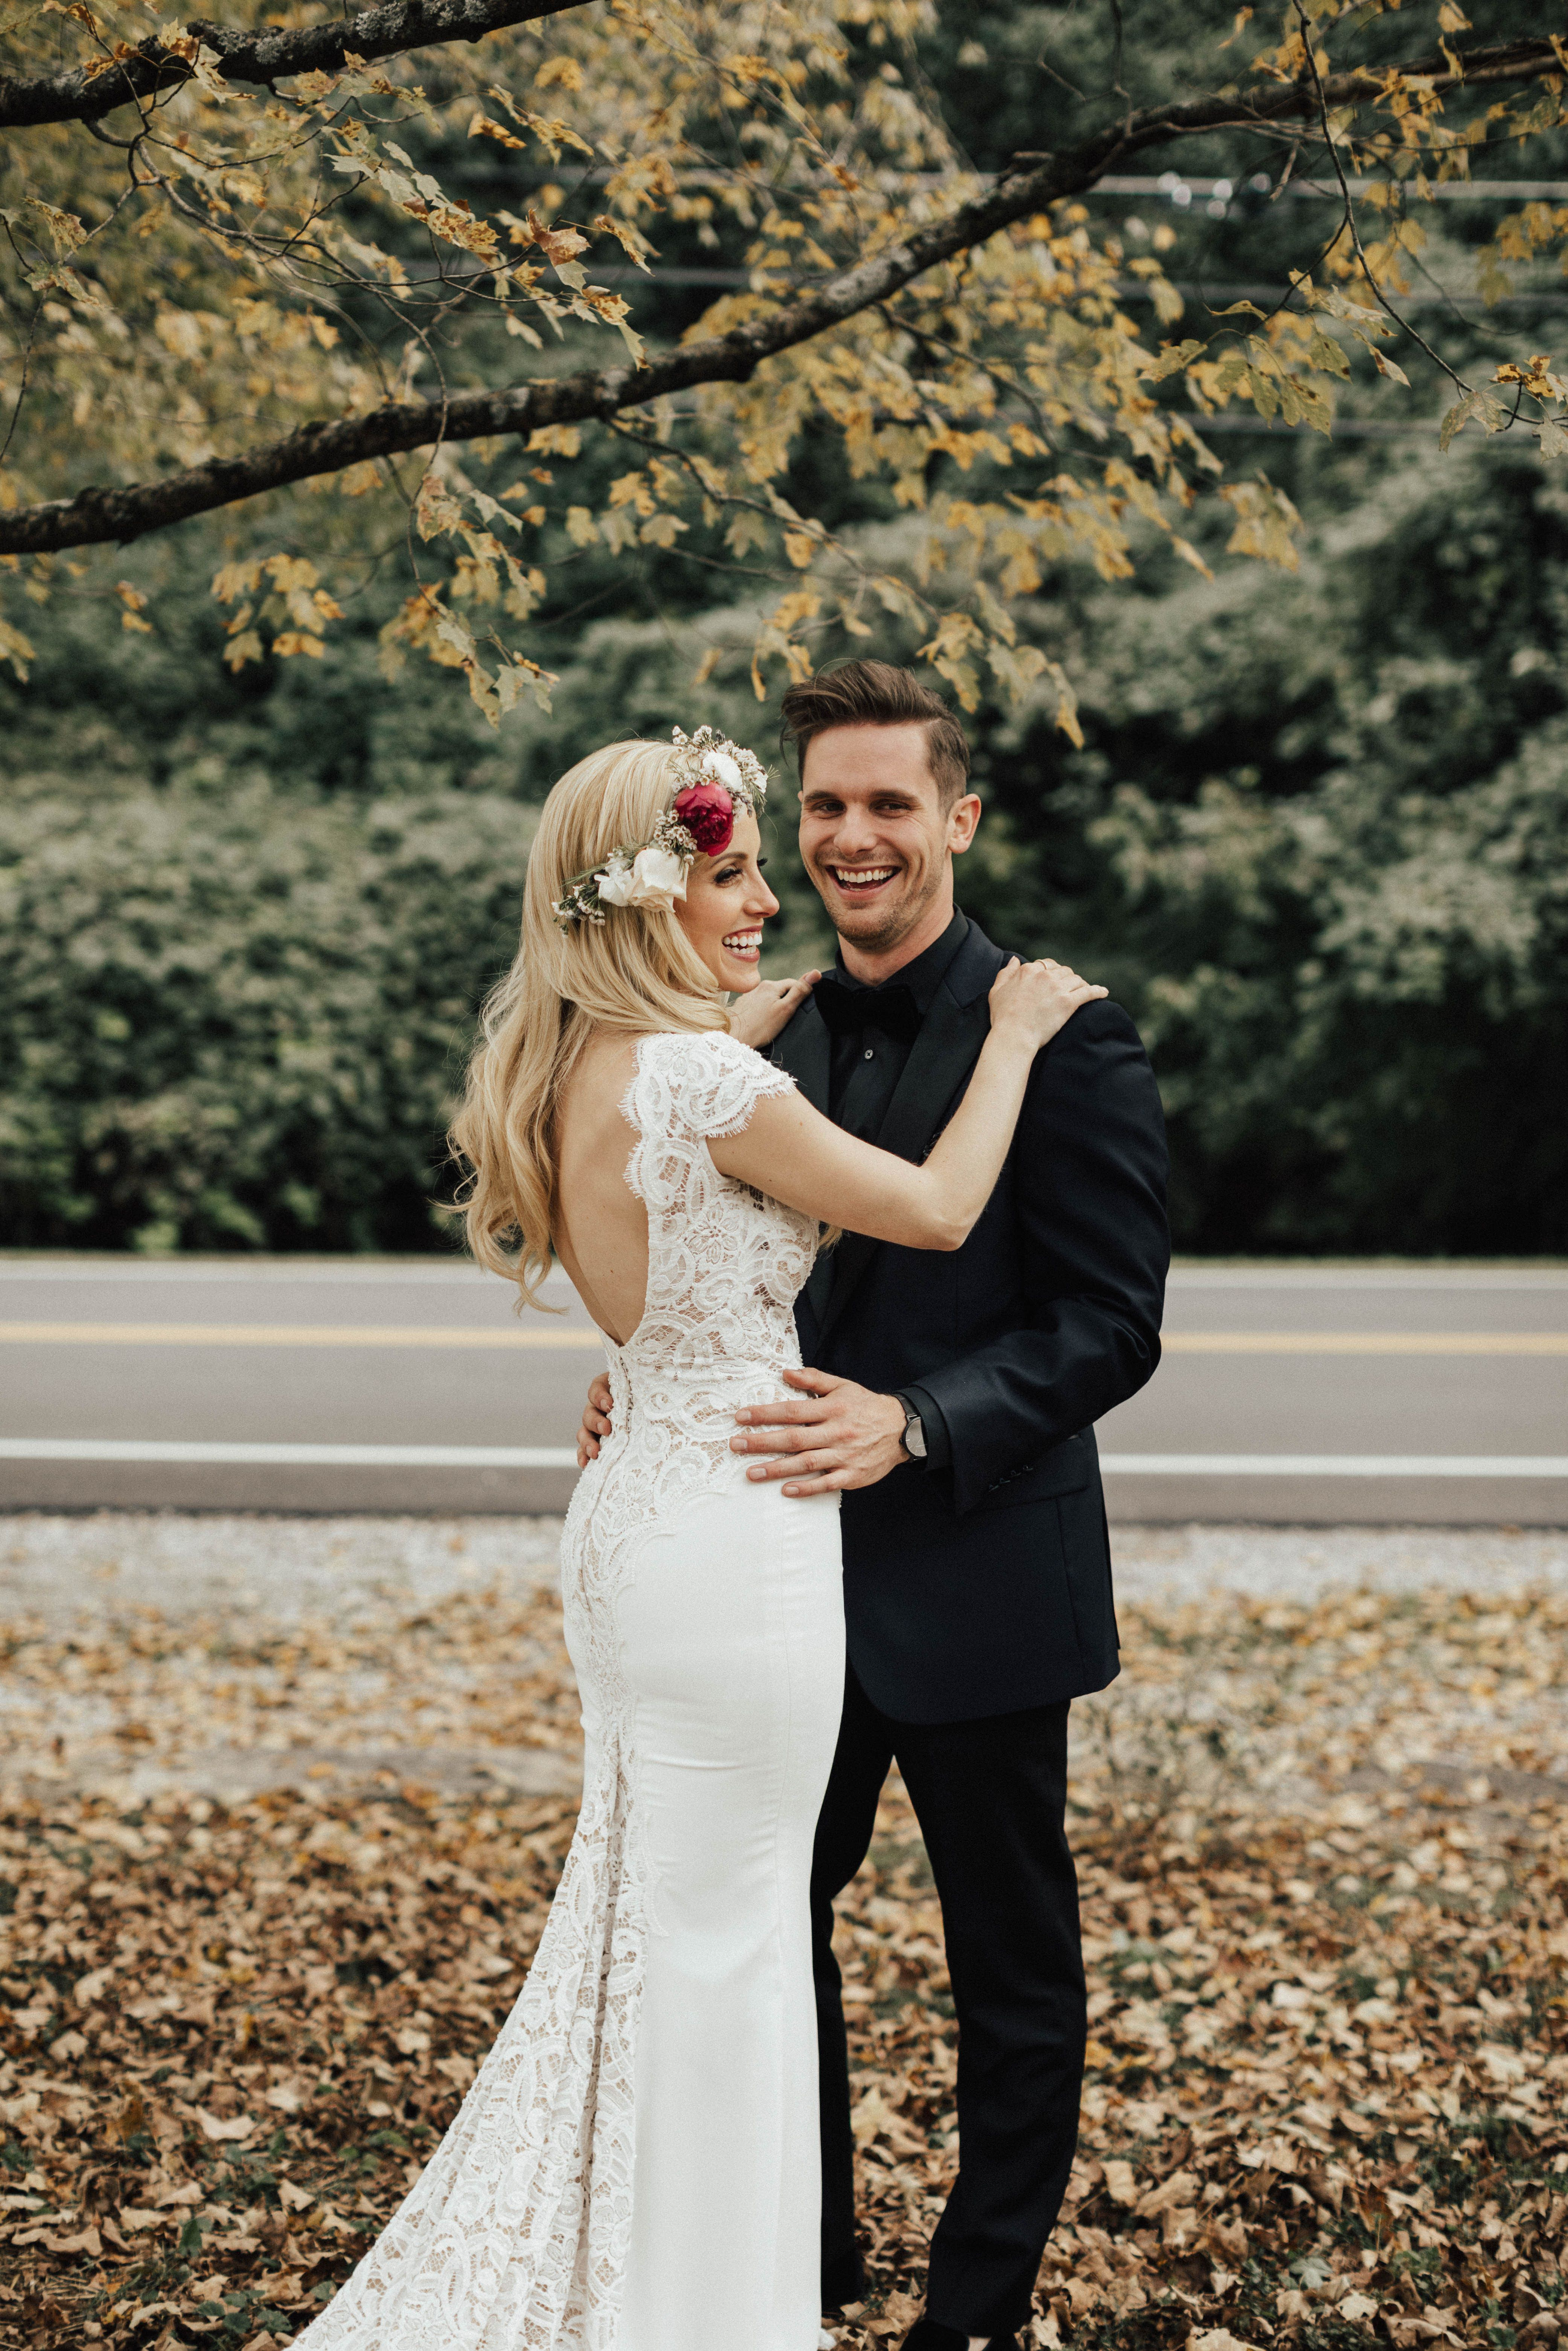 Autumn wedding dress ideas for a fall wedding drakewood farms